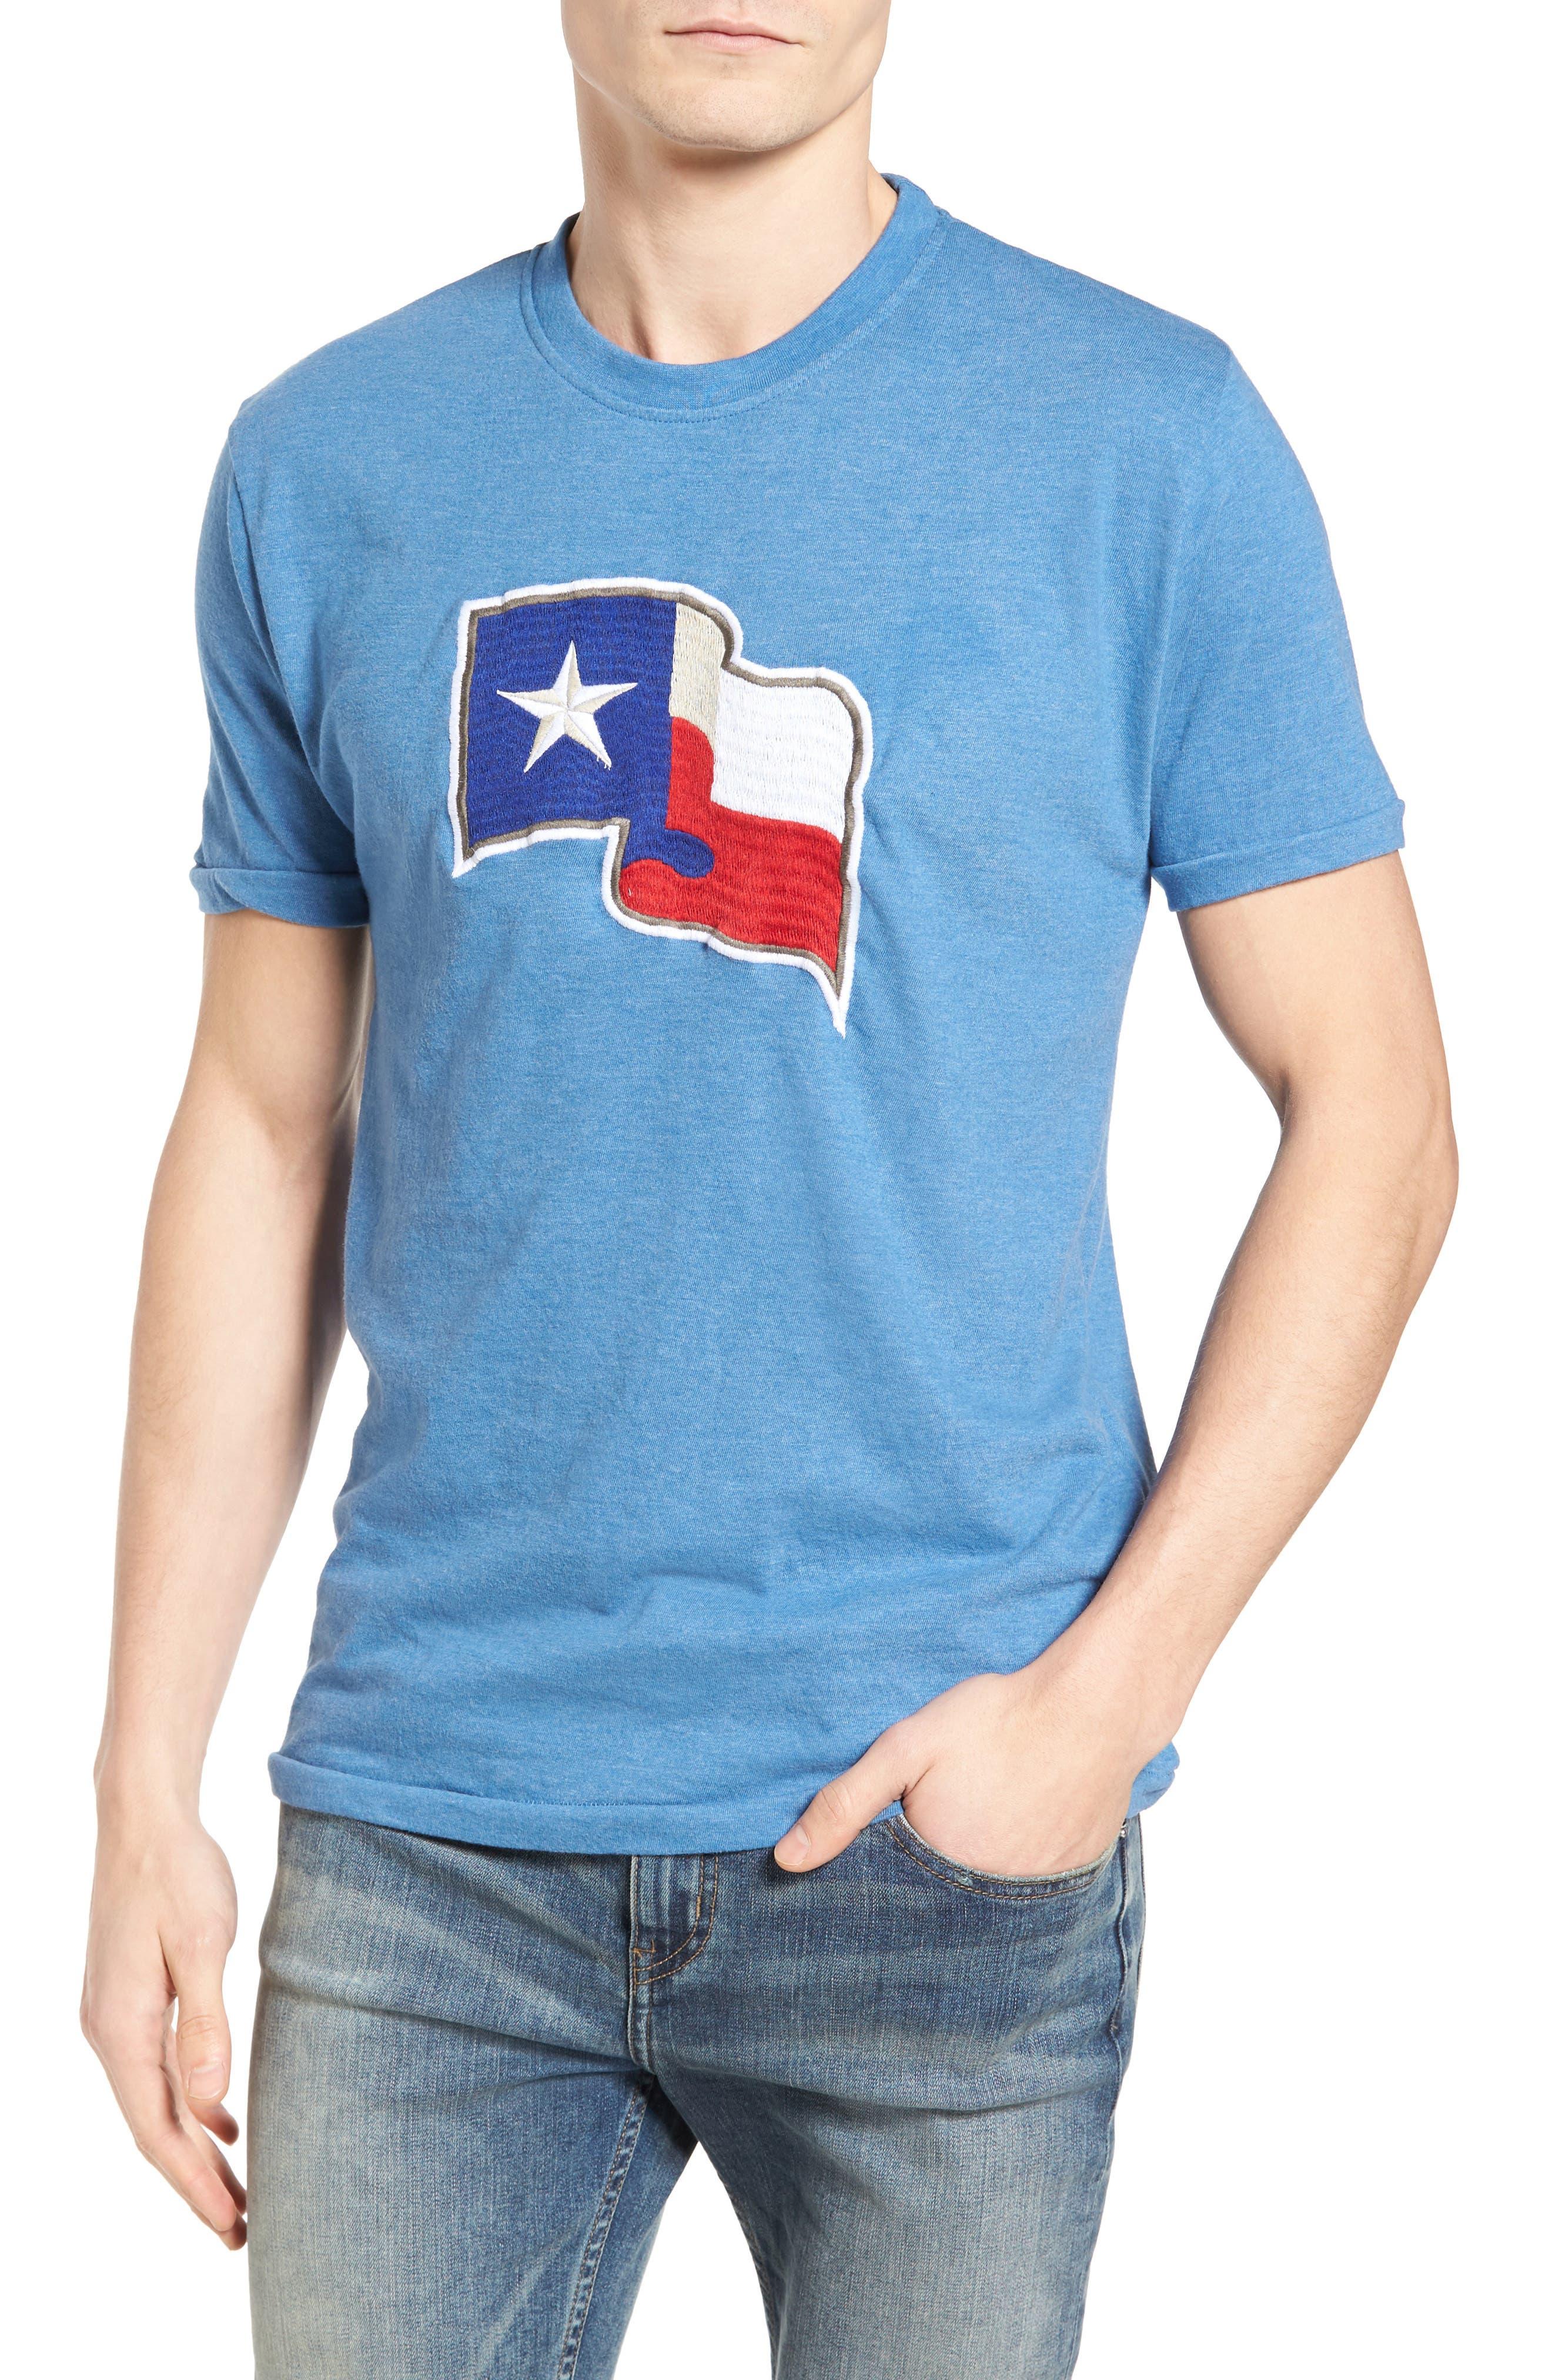 Hillwood Texas Rangers T-Shirt,                             Main thumbnail 1, color,                             450